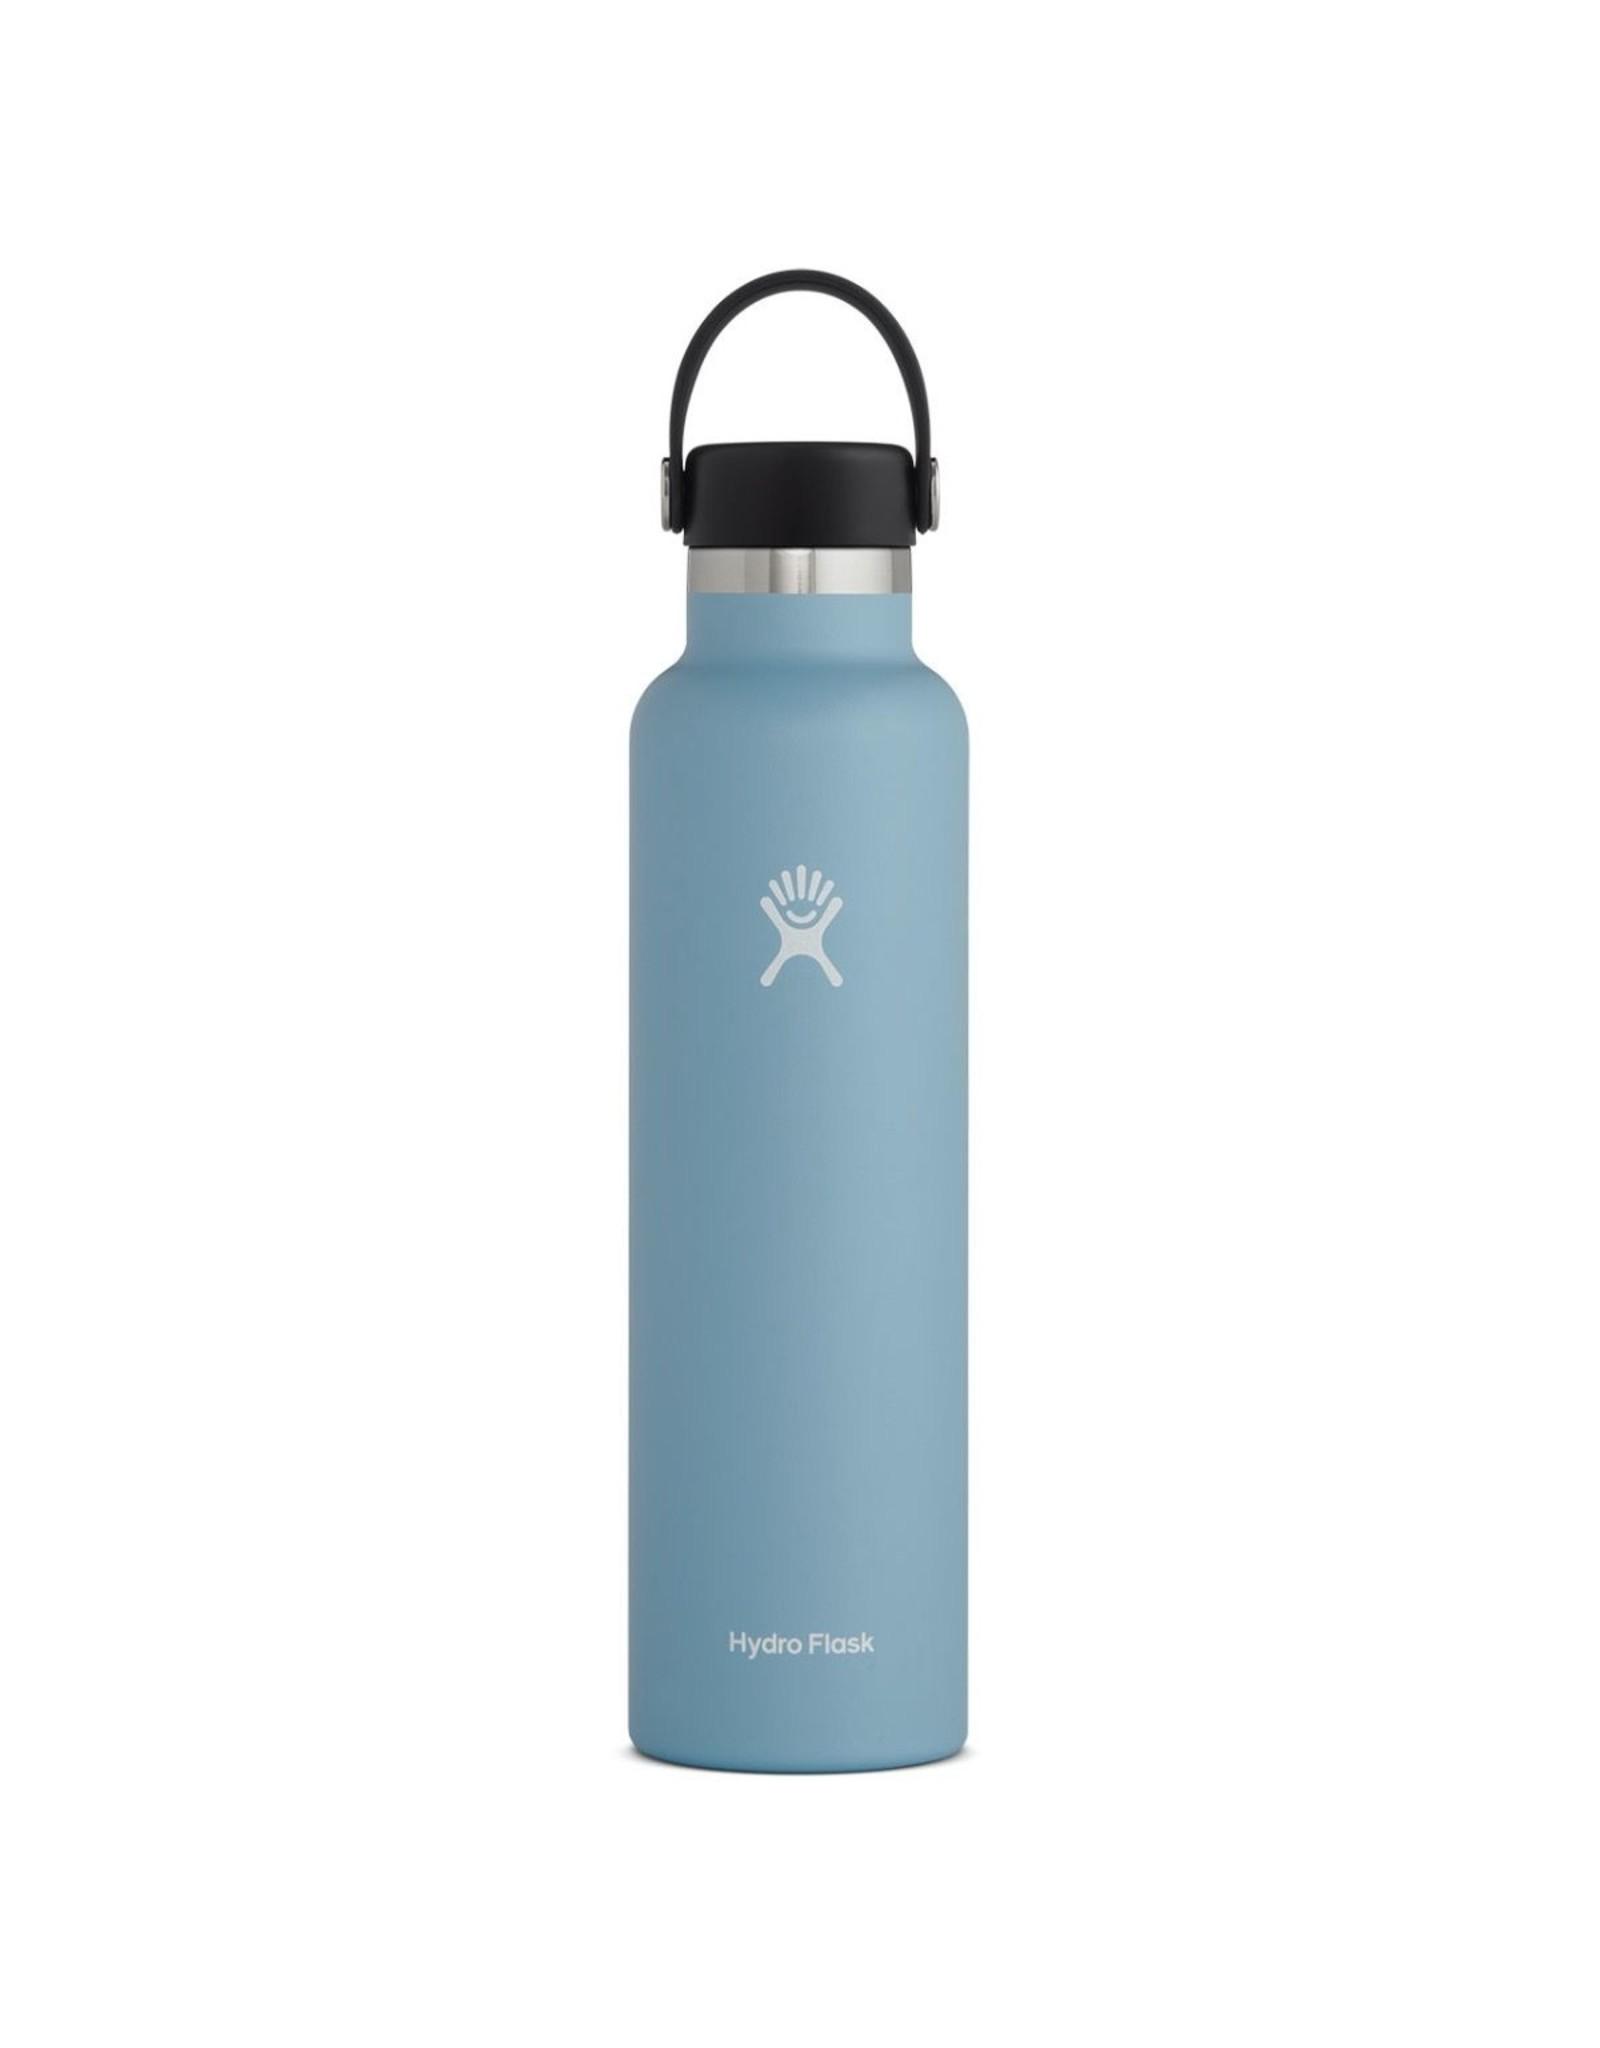 Hydro Flask Hydro Flask 24oz Standard Mouth w/ Flex Cap Rain